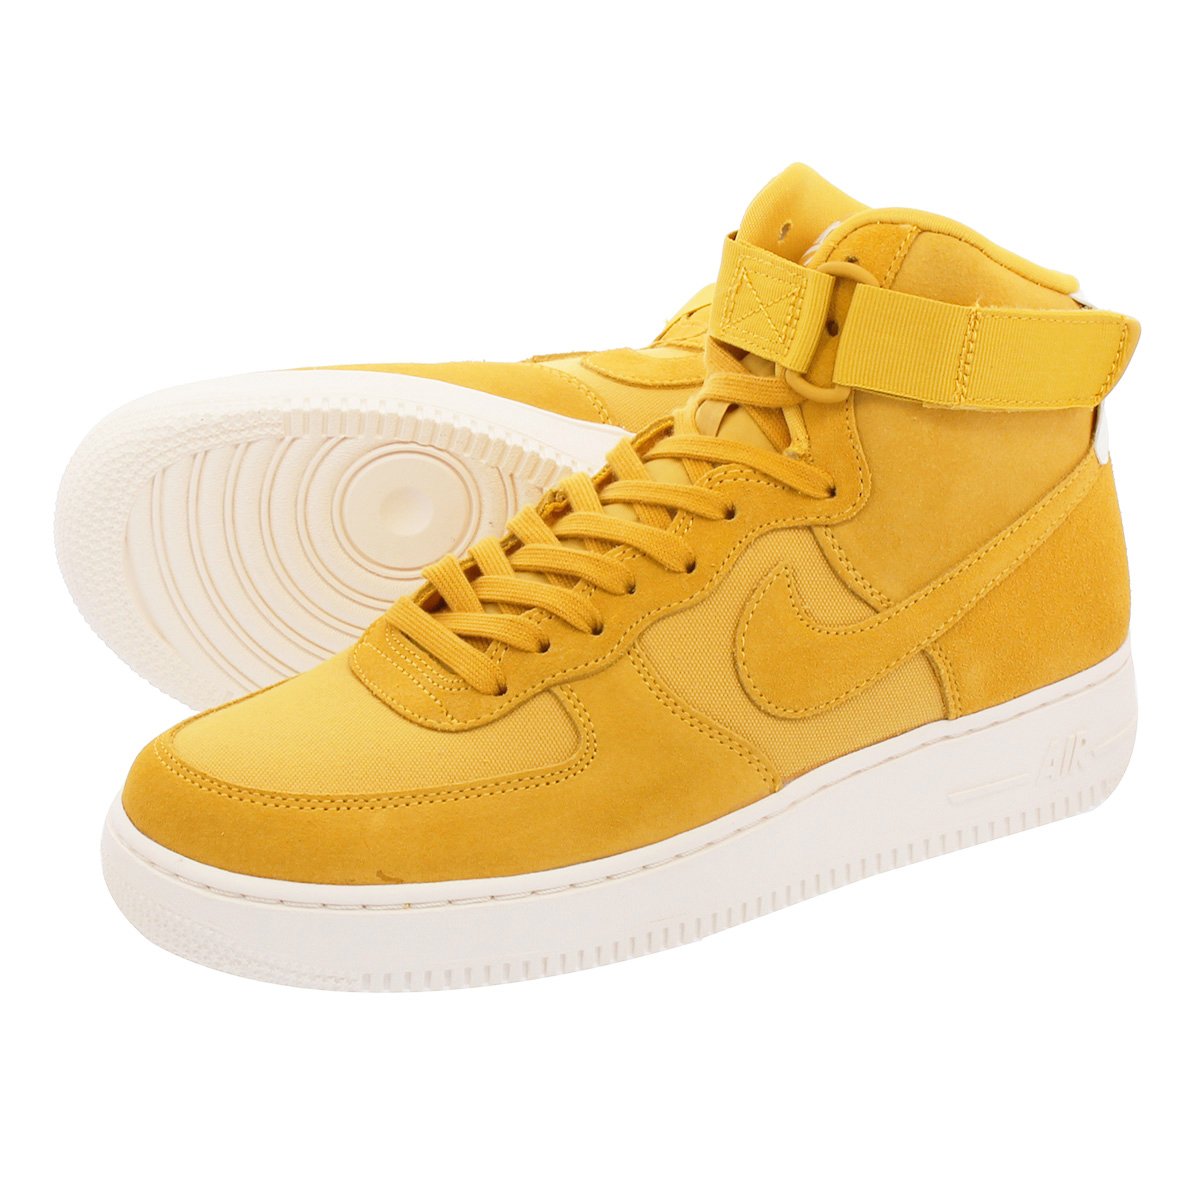 NIKE AIR FORCE 1 HIGH 07 SUEDE Nike air force 1 high 07 suede YELLOWOCHRESAIL aq8649 700